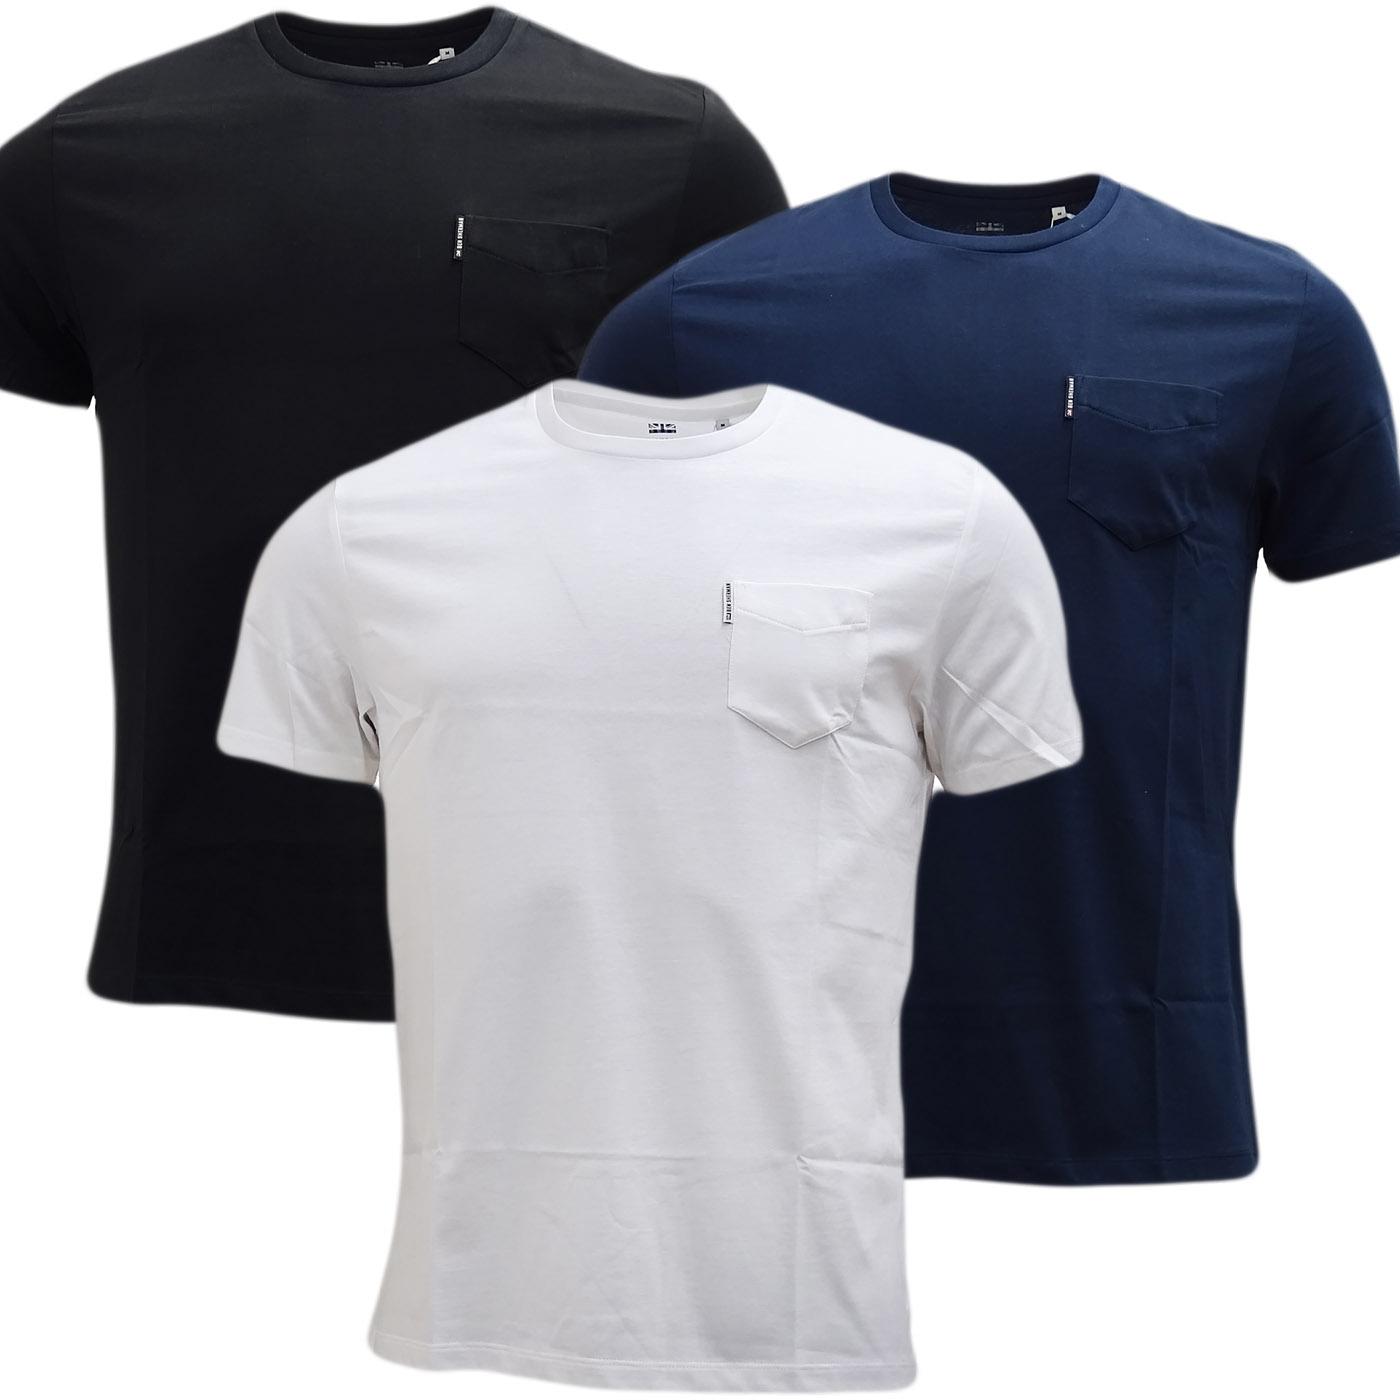 Ben Sherman Plain Pocket T-Shirt - Mb13645